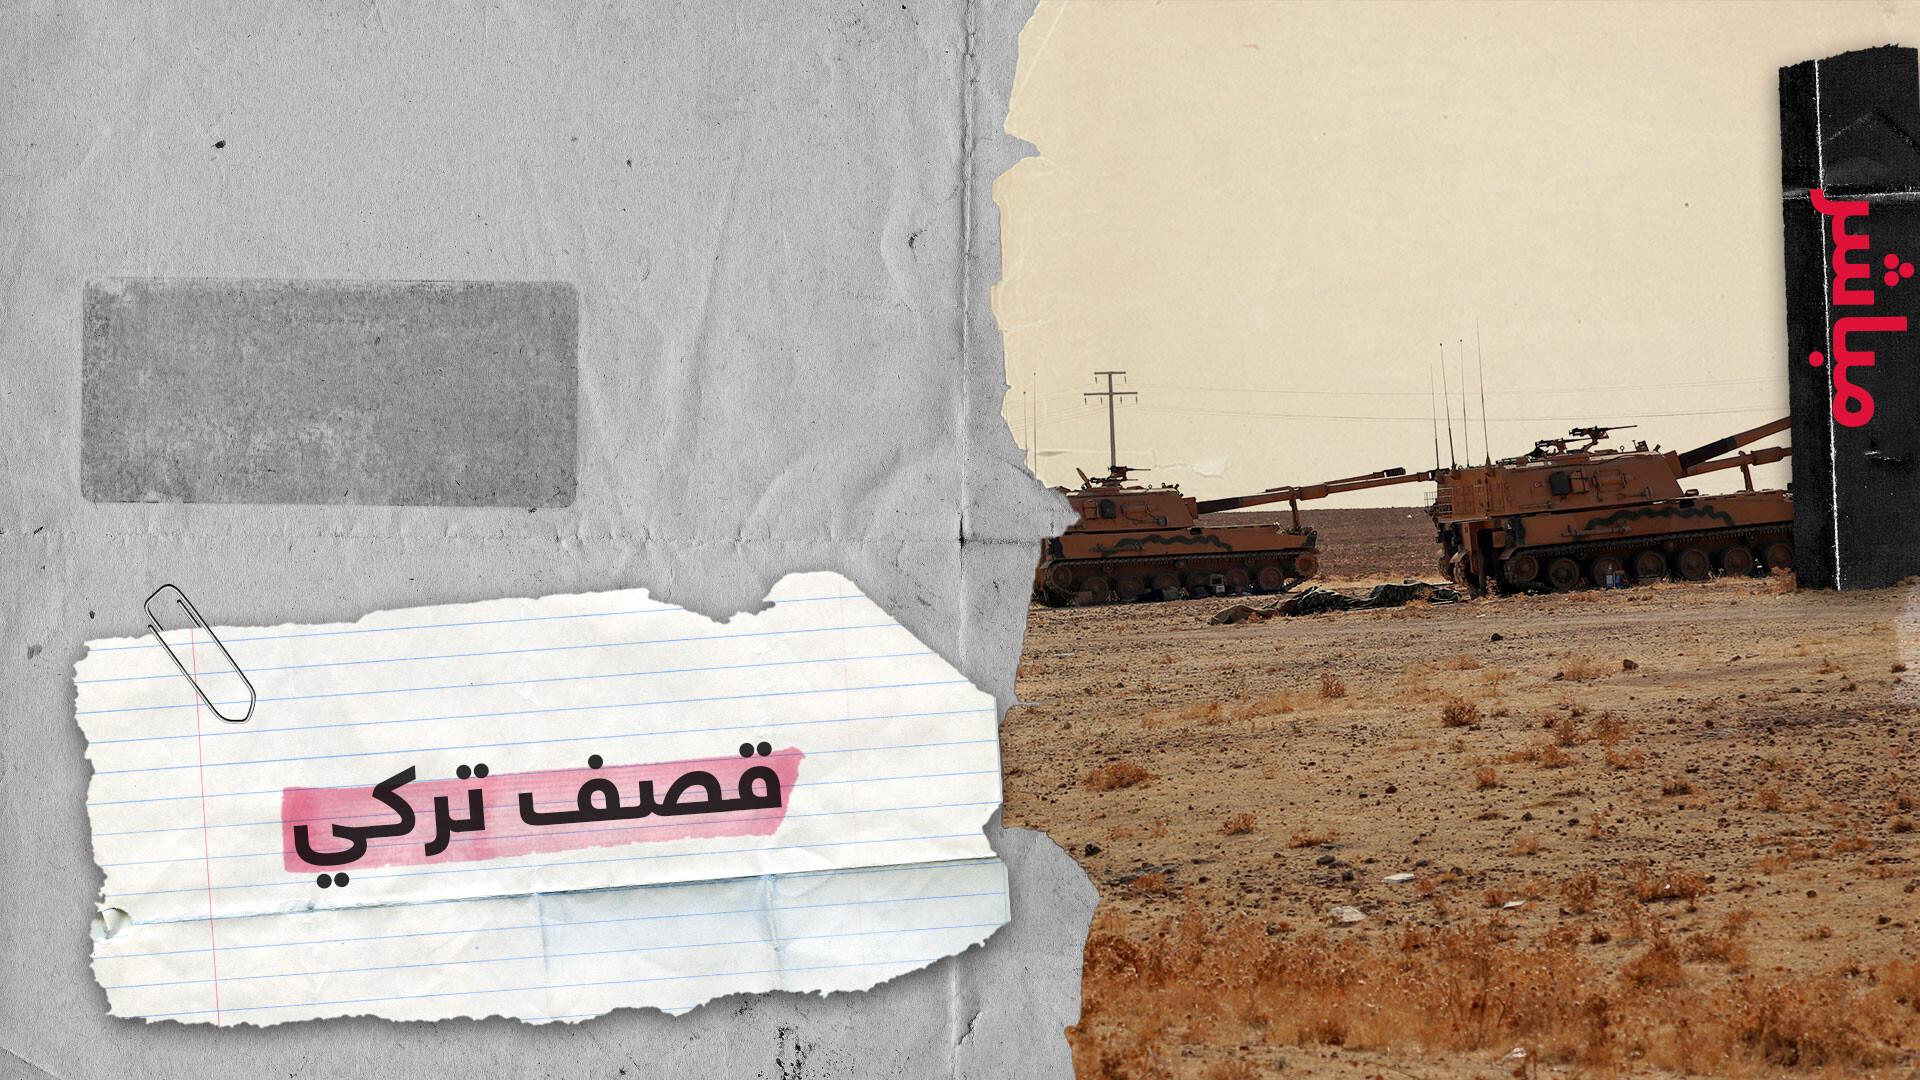 قصف تركي وزحف بري على شمال شرق سوريا